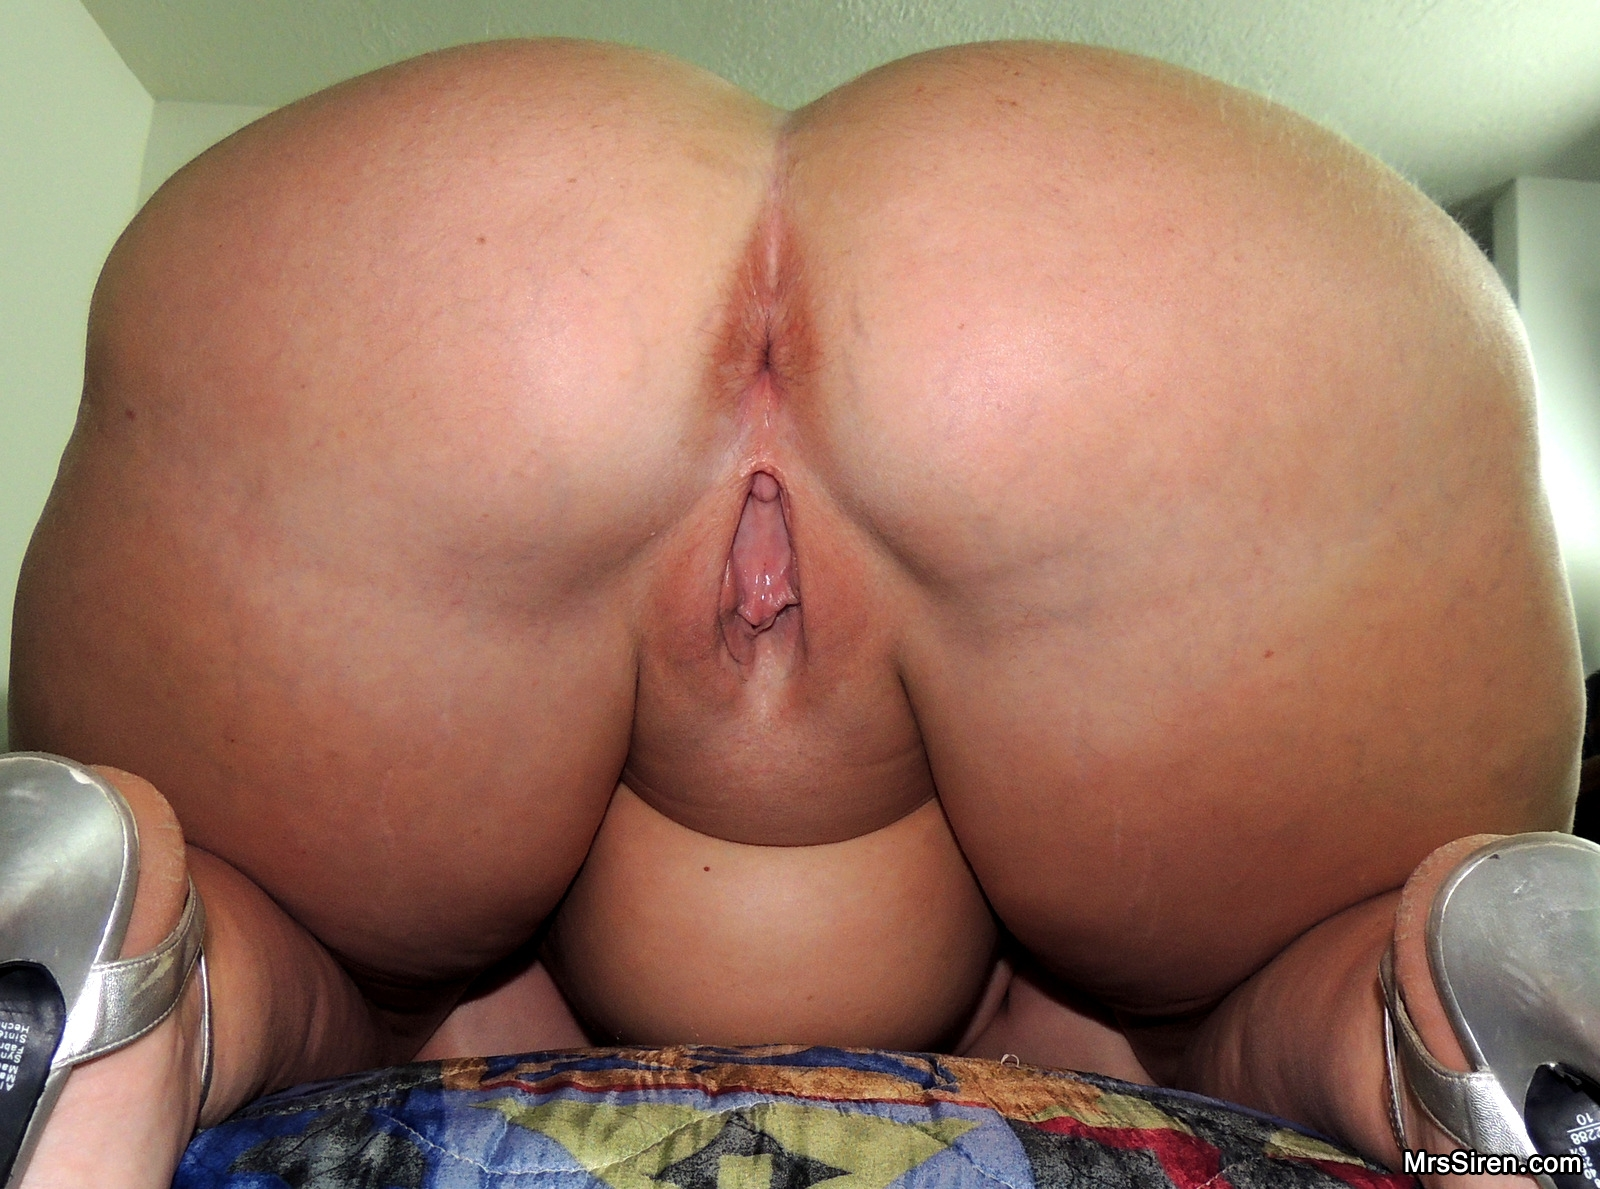 My wife039s ass full of milk culo esposa lleno de leche - 3 4